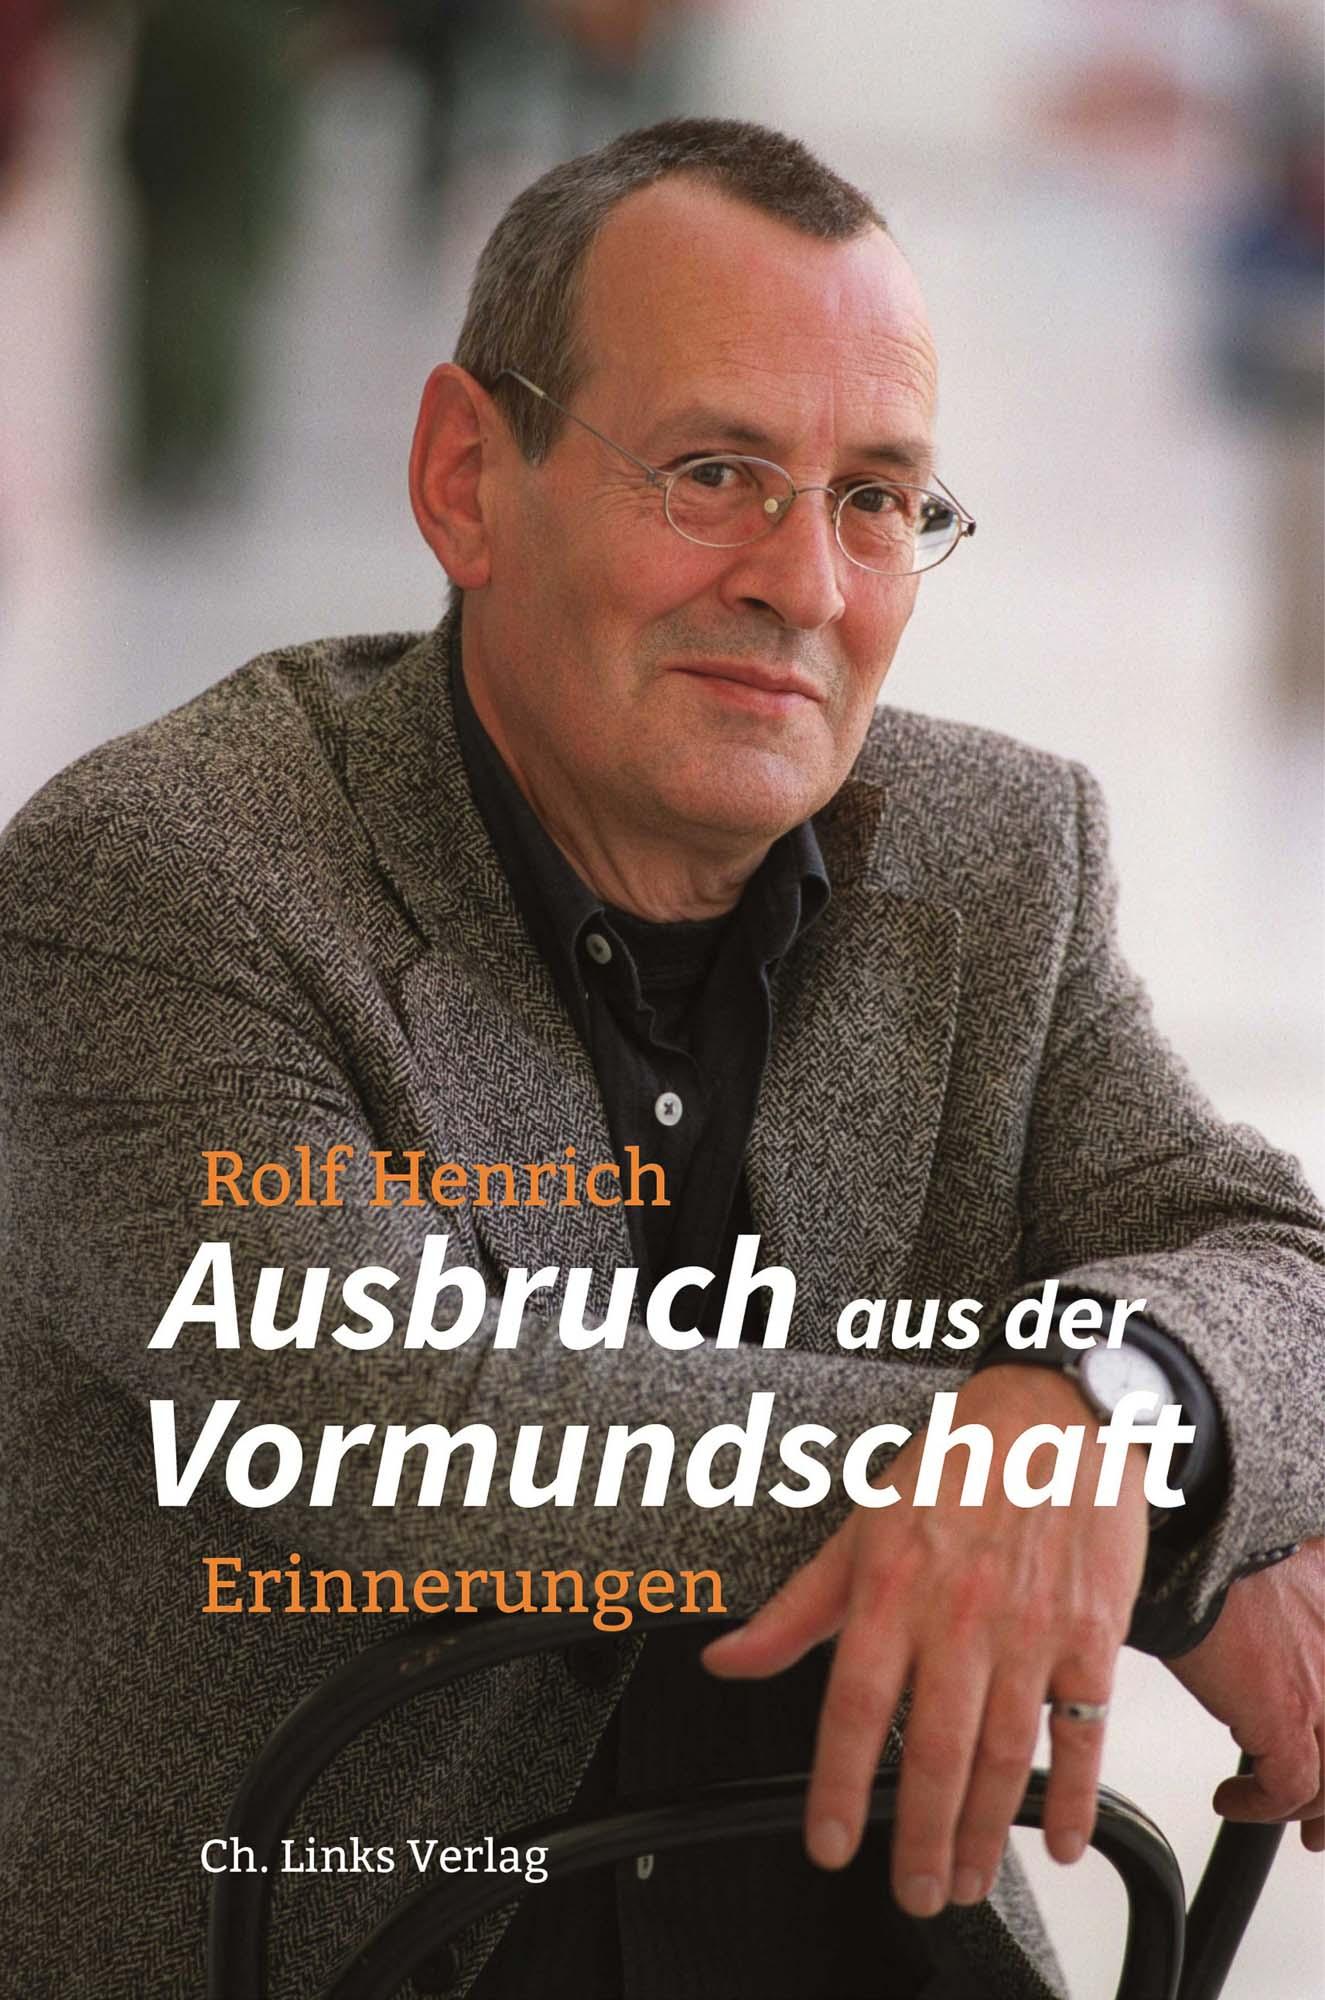 FO_RolfHeinrichBuch_image_G12_19_2400 x 3624.jpg